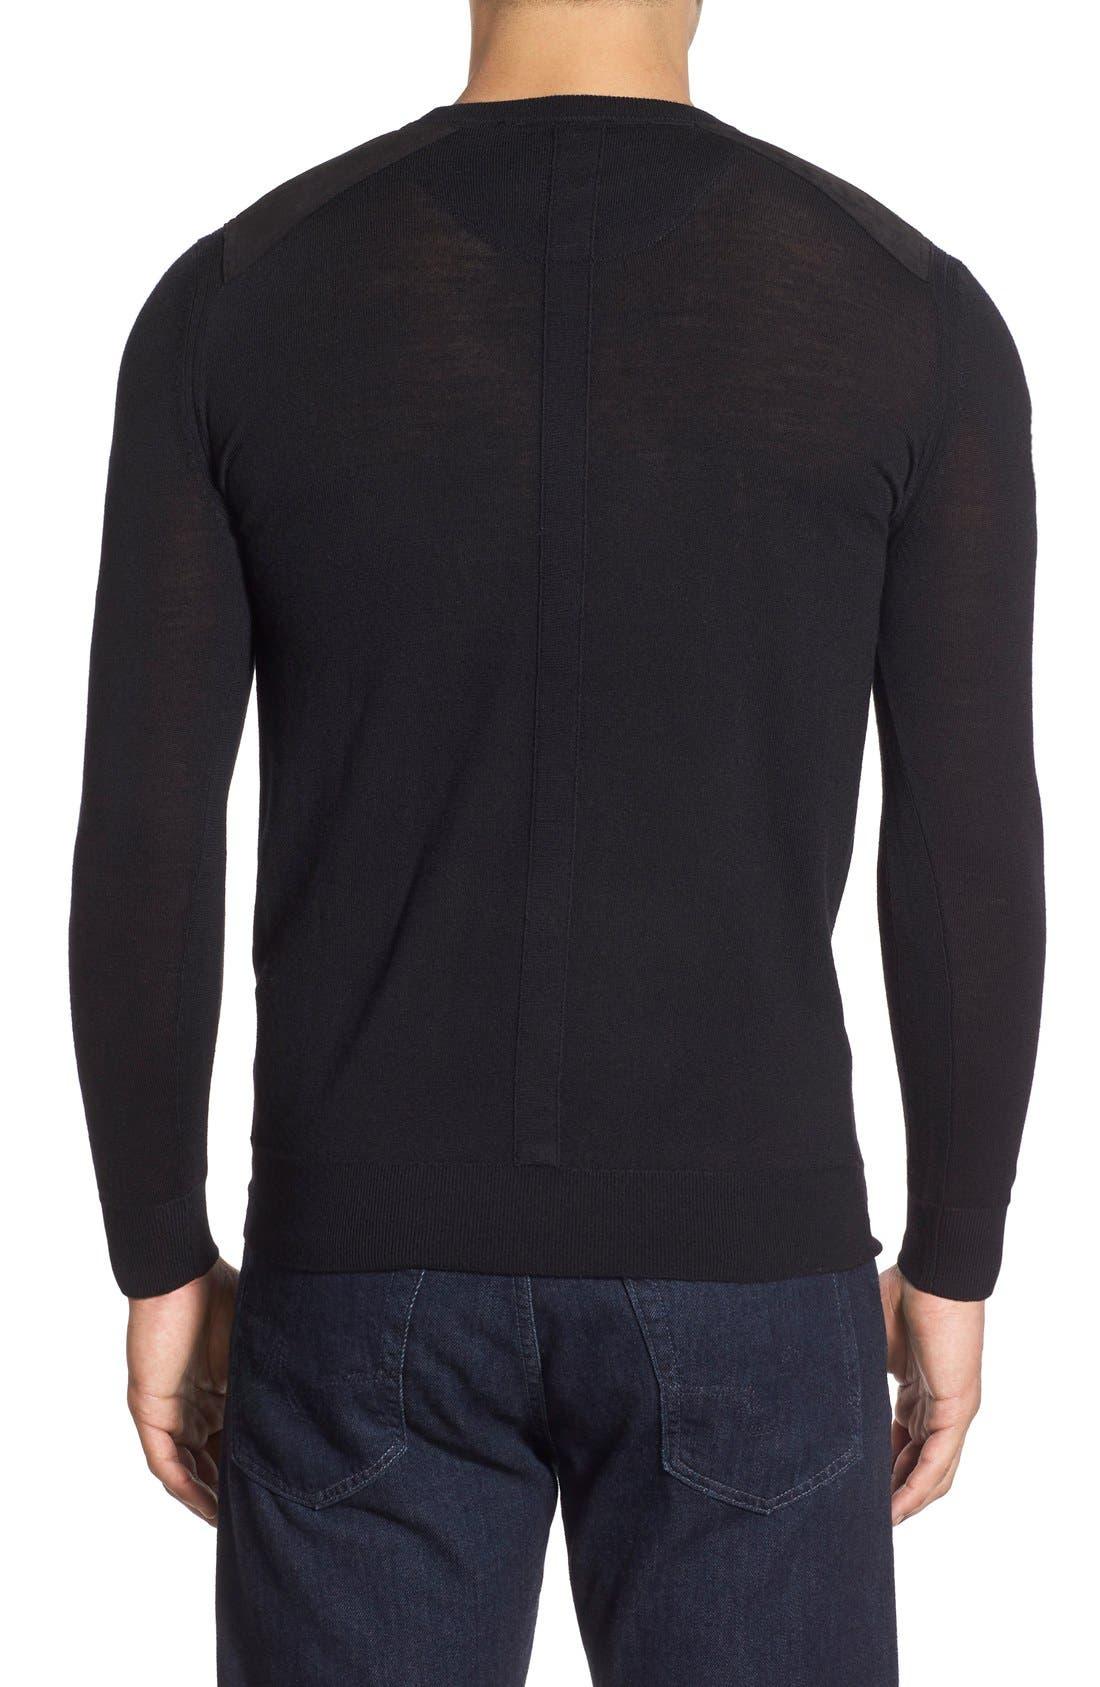 Regular Fit Crewneck Sweater,                             Alternate thumbnail 6, color,                             001